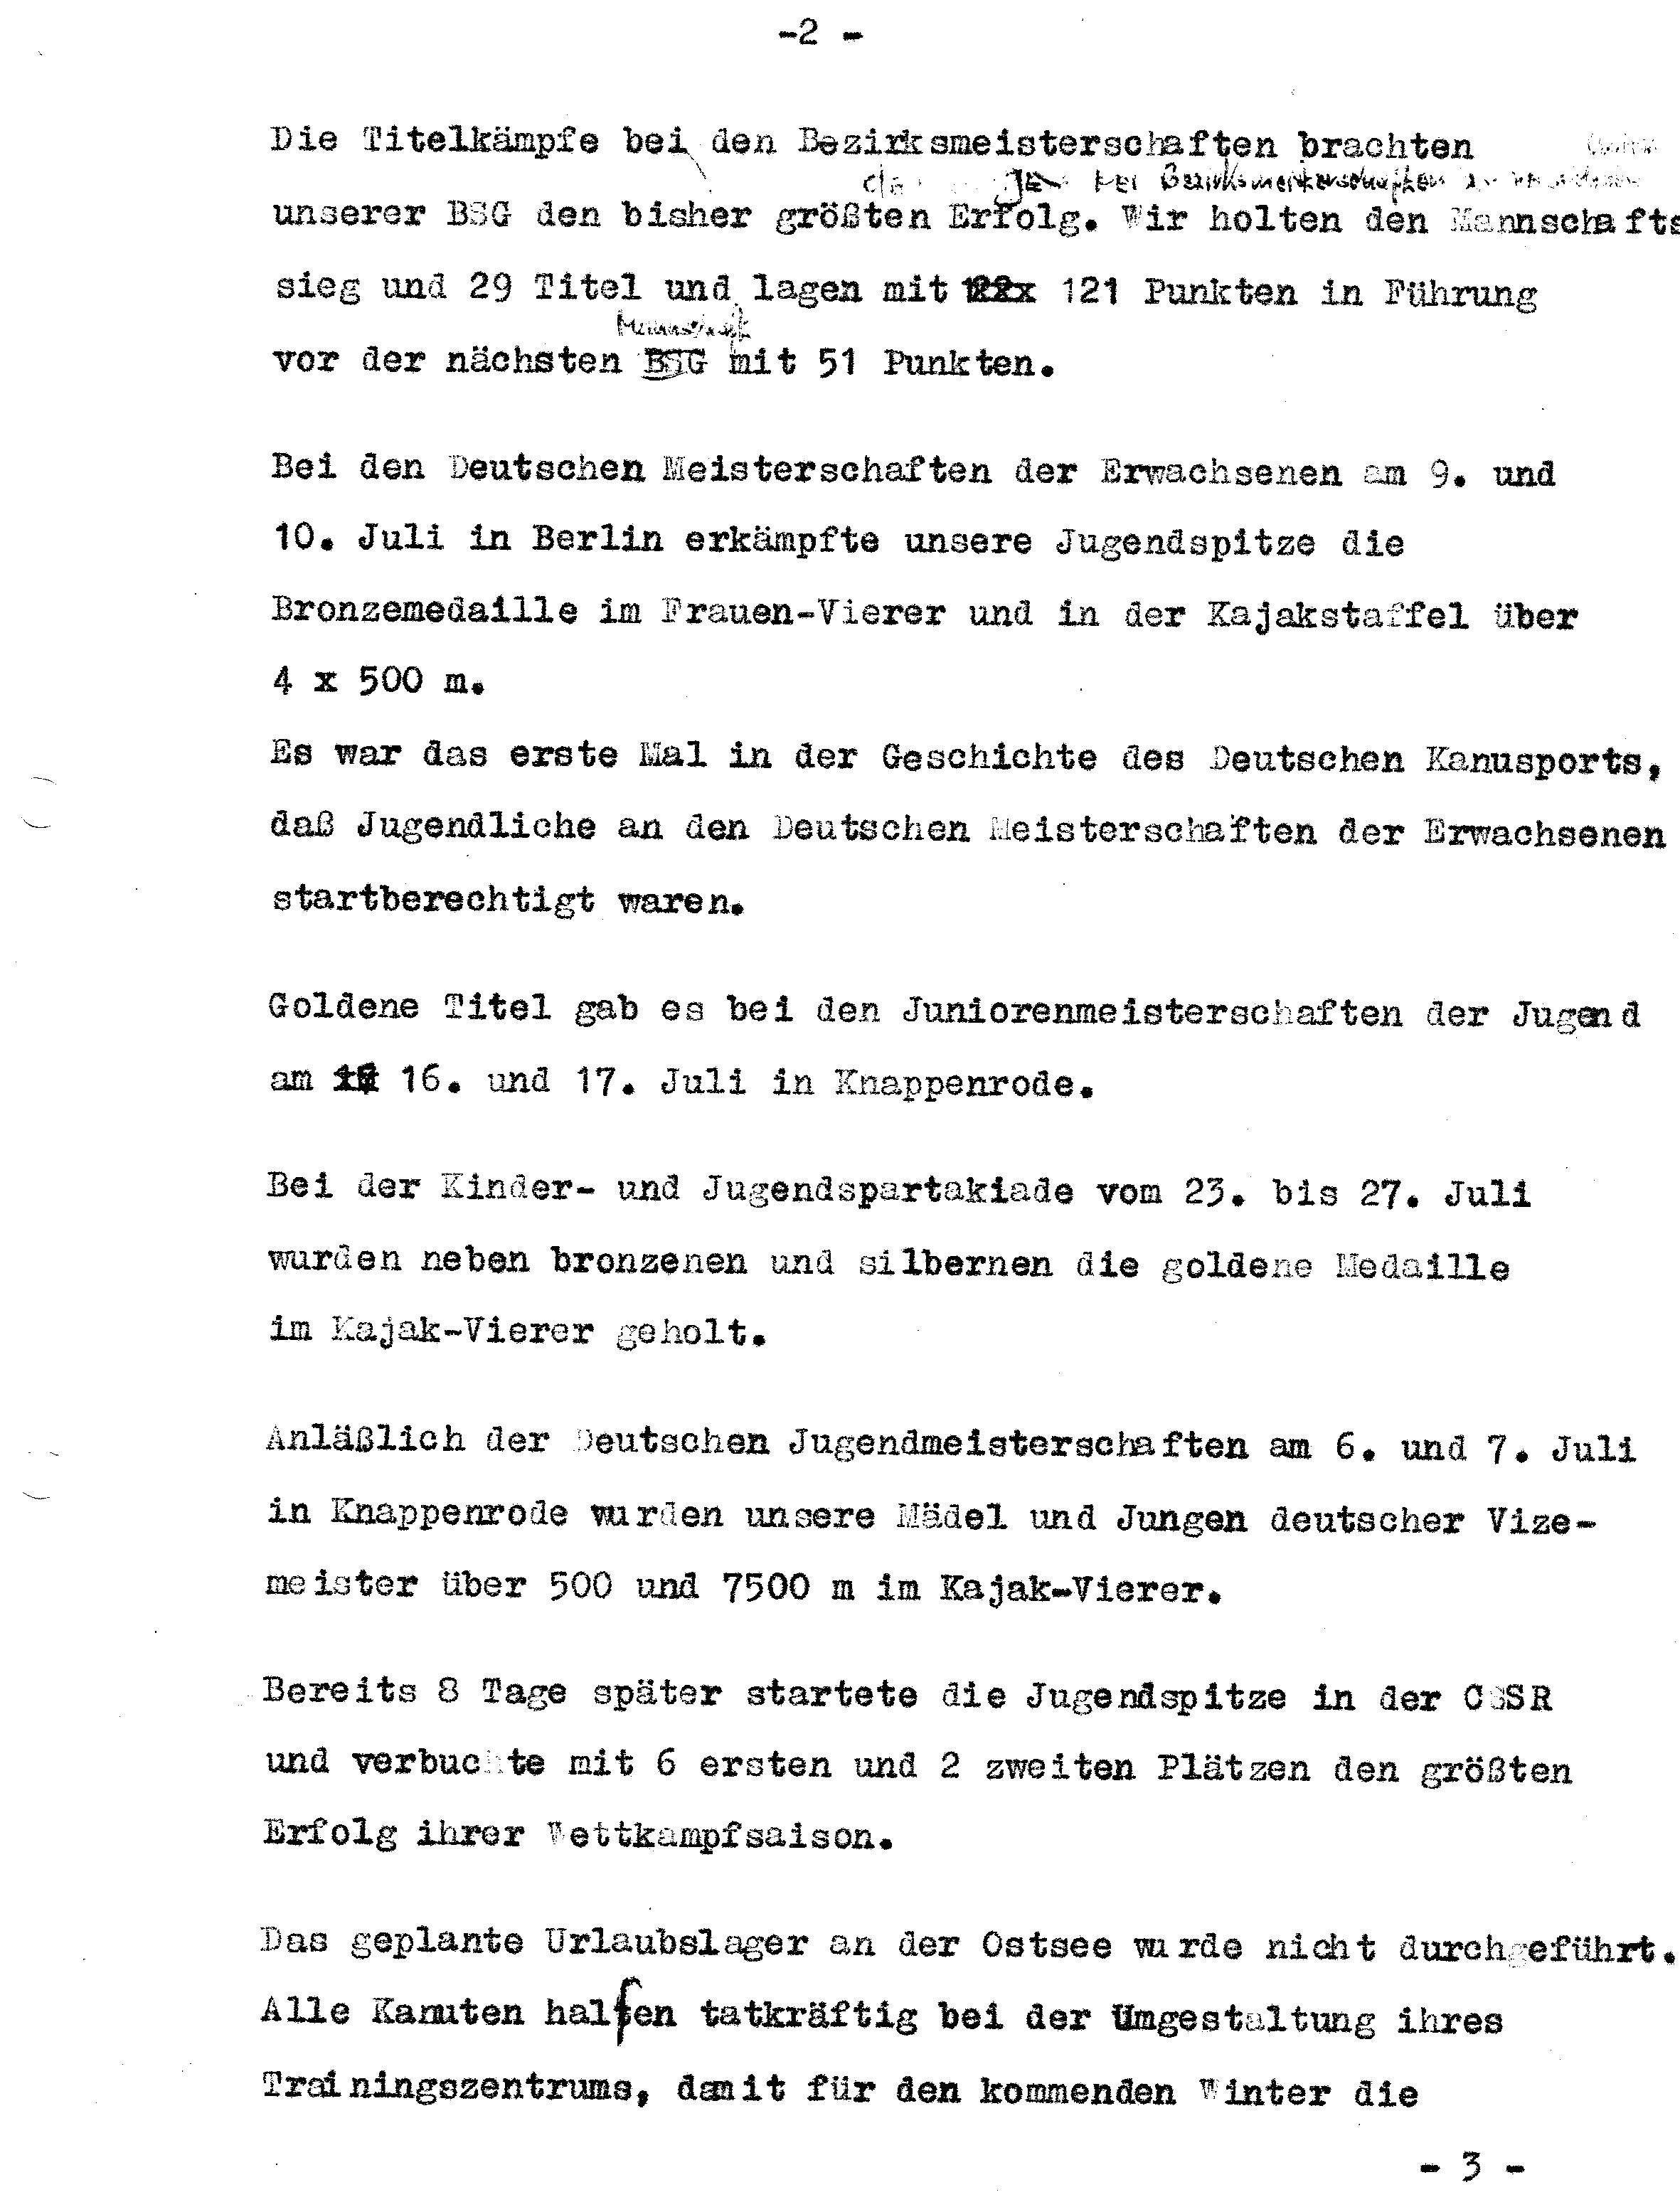 1966 Jahresbericht Erfolge Sektion (2)